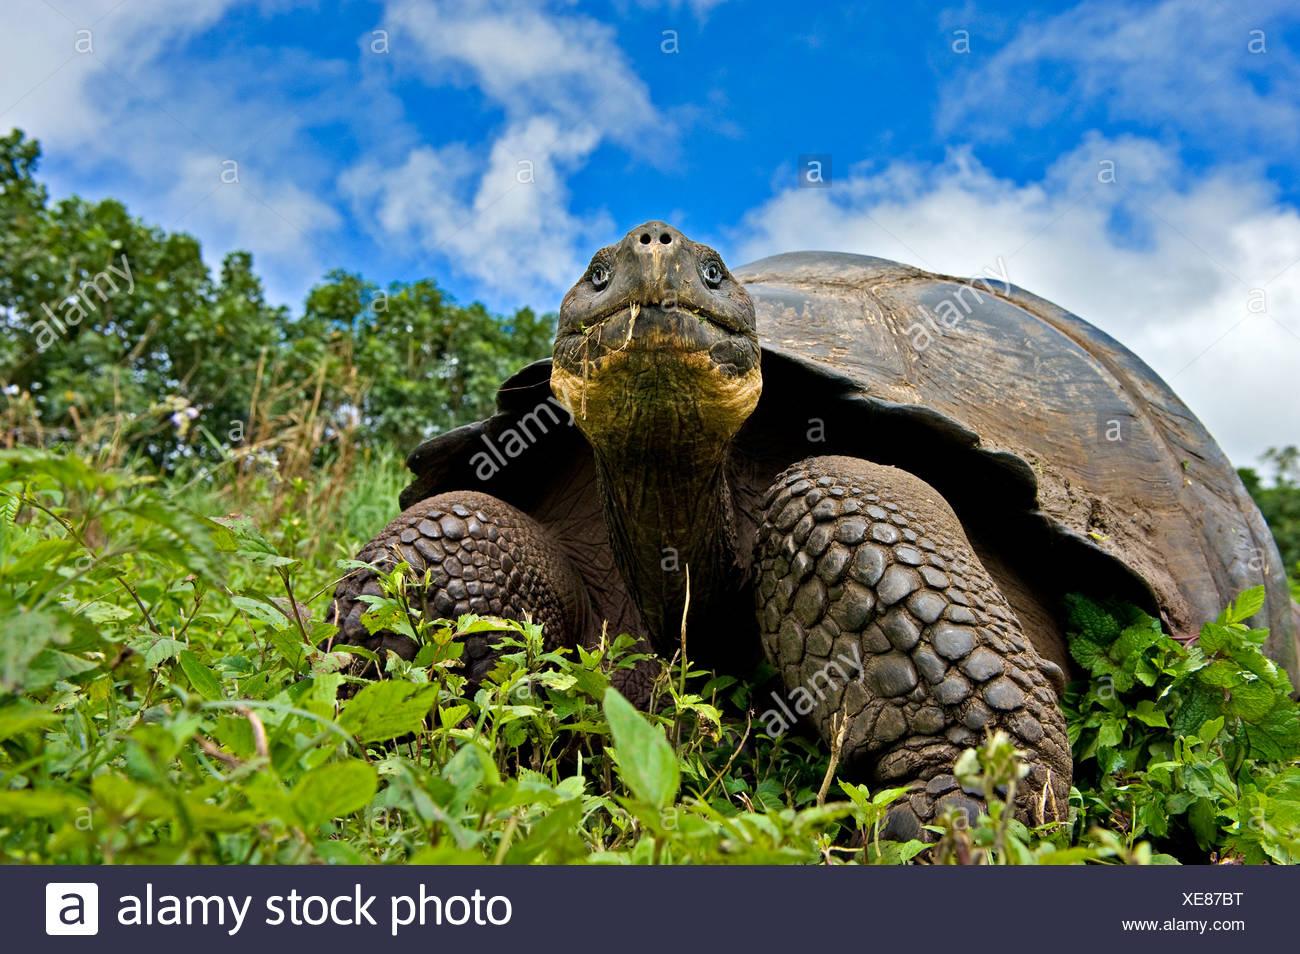 Galapagos giant tortoise (Geochelone elephantopus / nigra) adult feeding, Santa Cruz, Galapagos - Stock Image